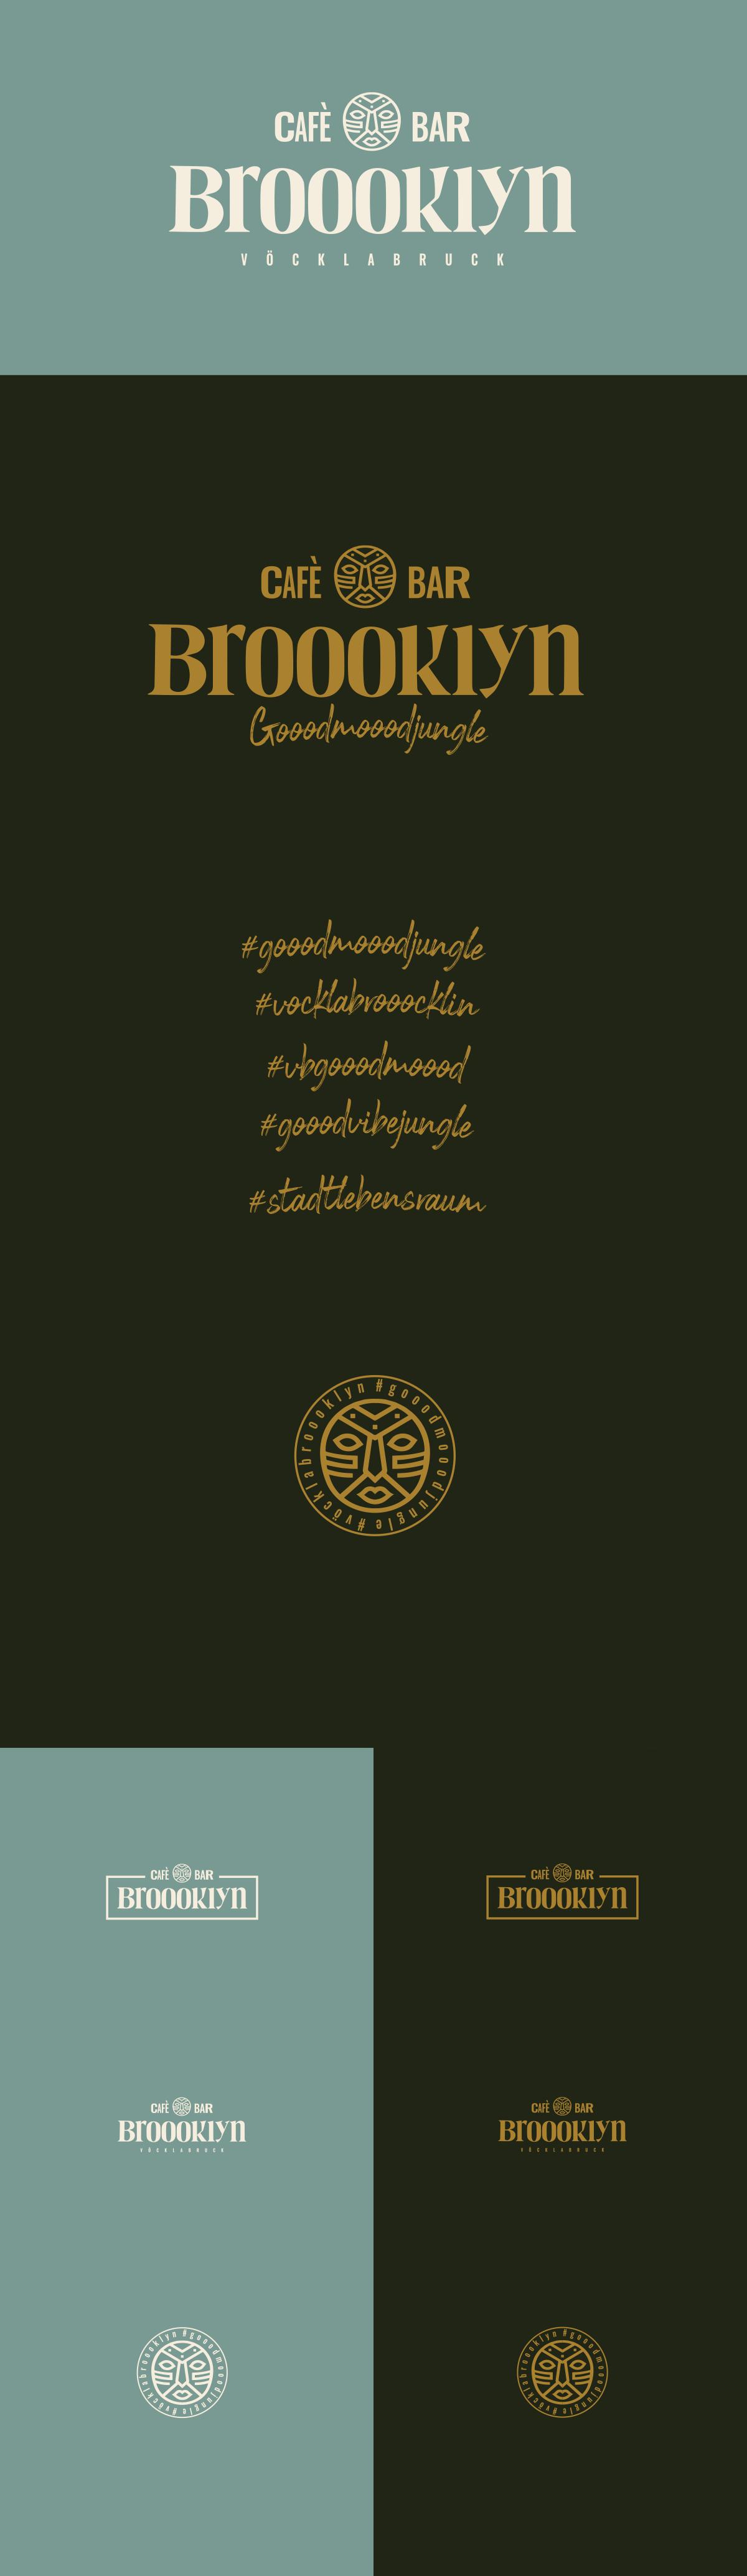 branding_broooklyn-titelseite-anti-form-michael-schumer